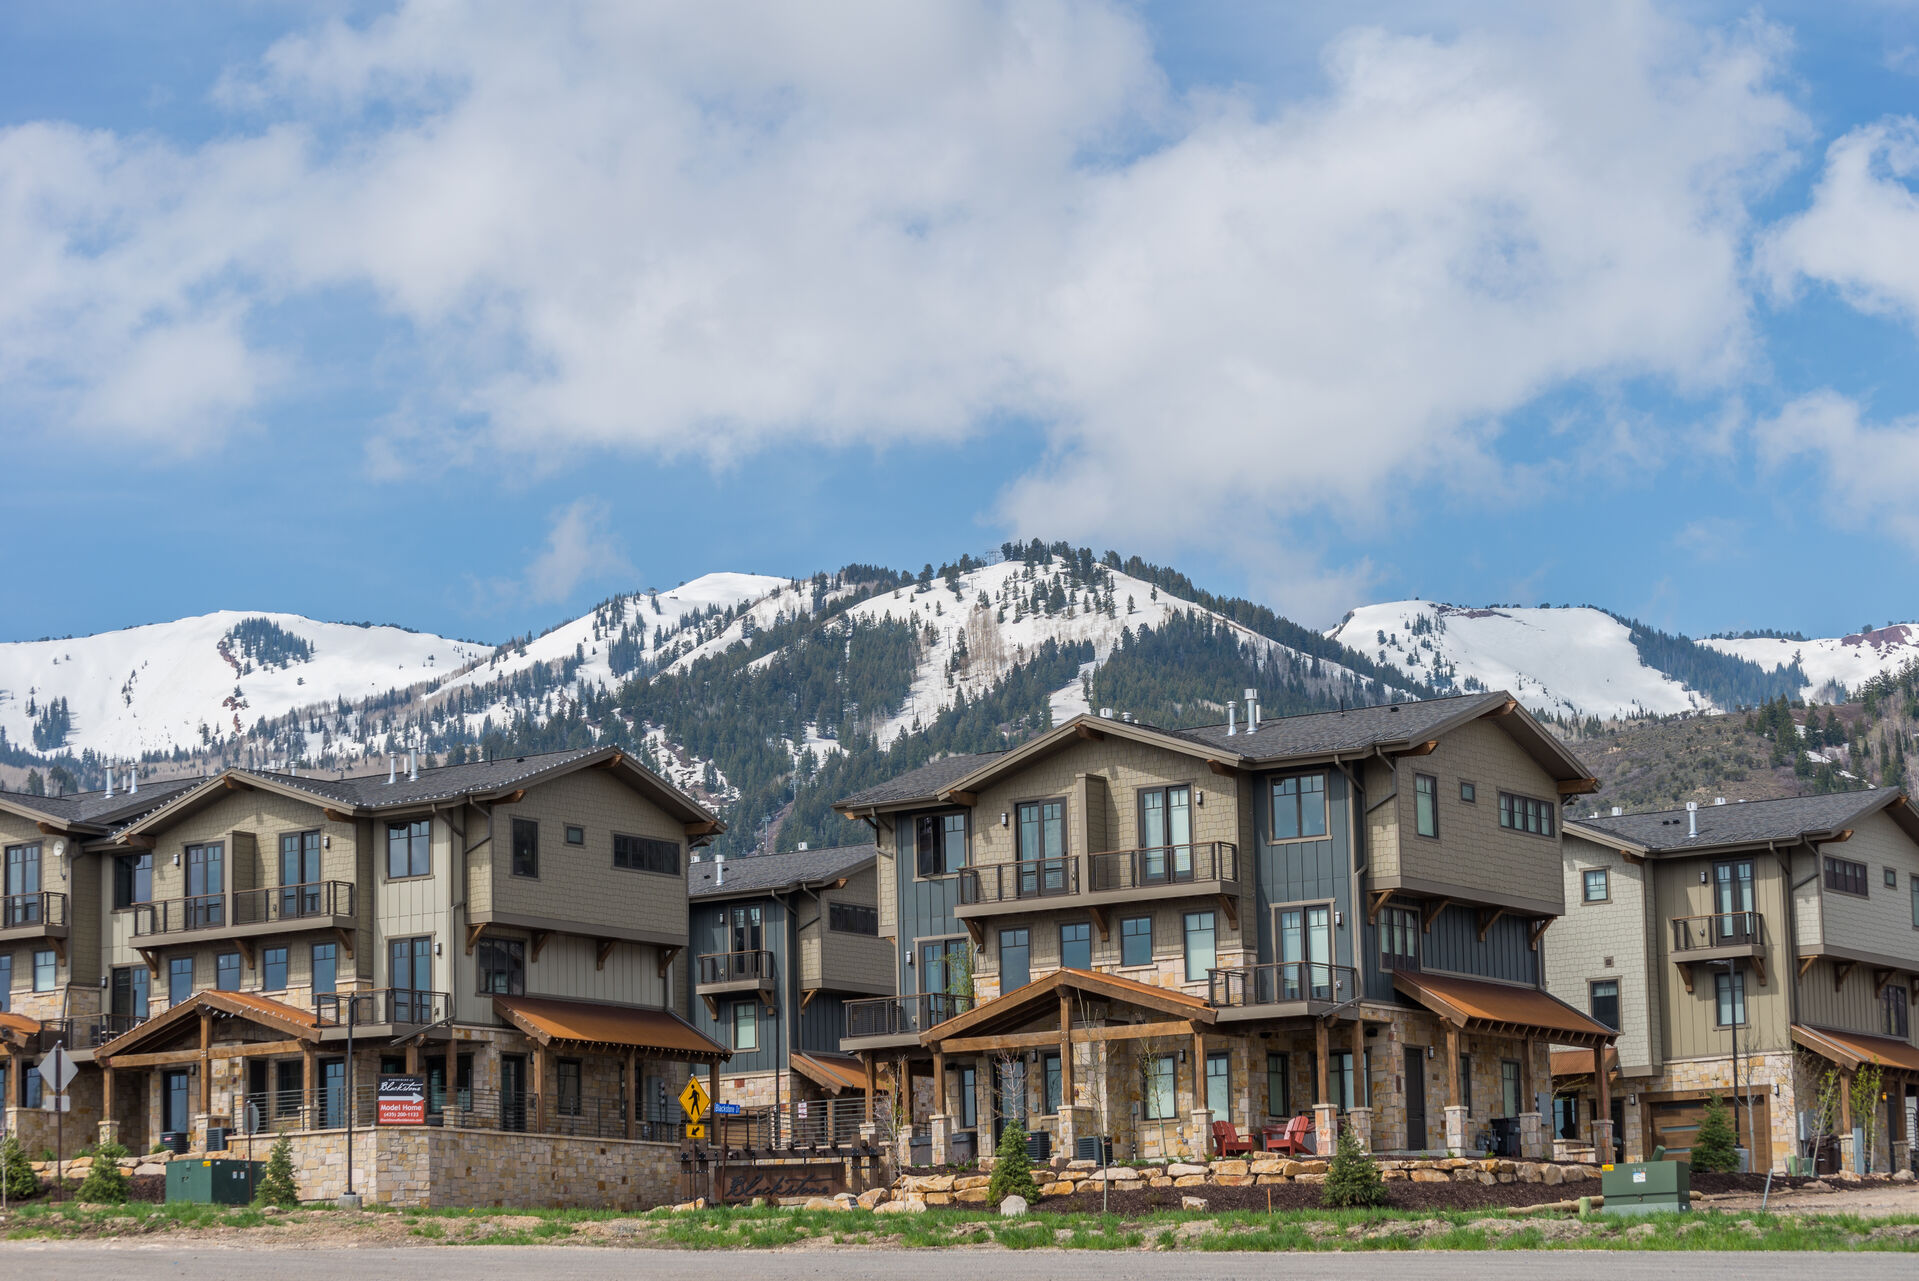 View of the Blackstone Community